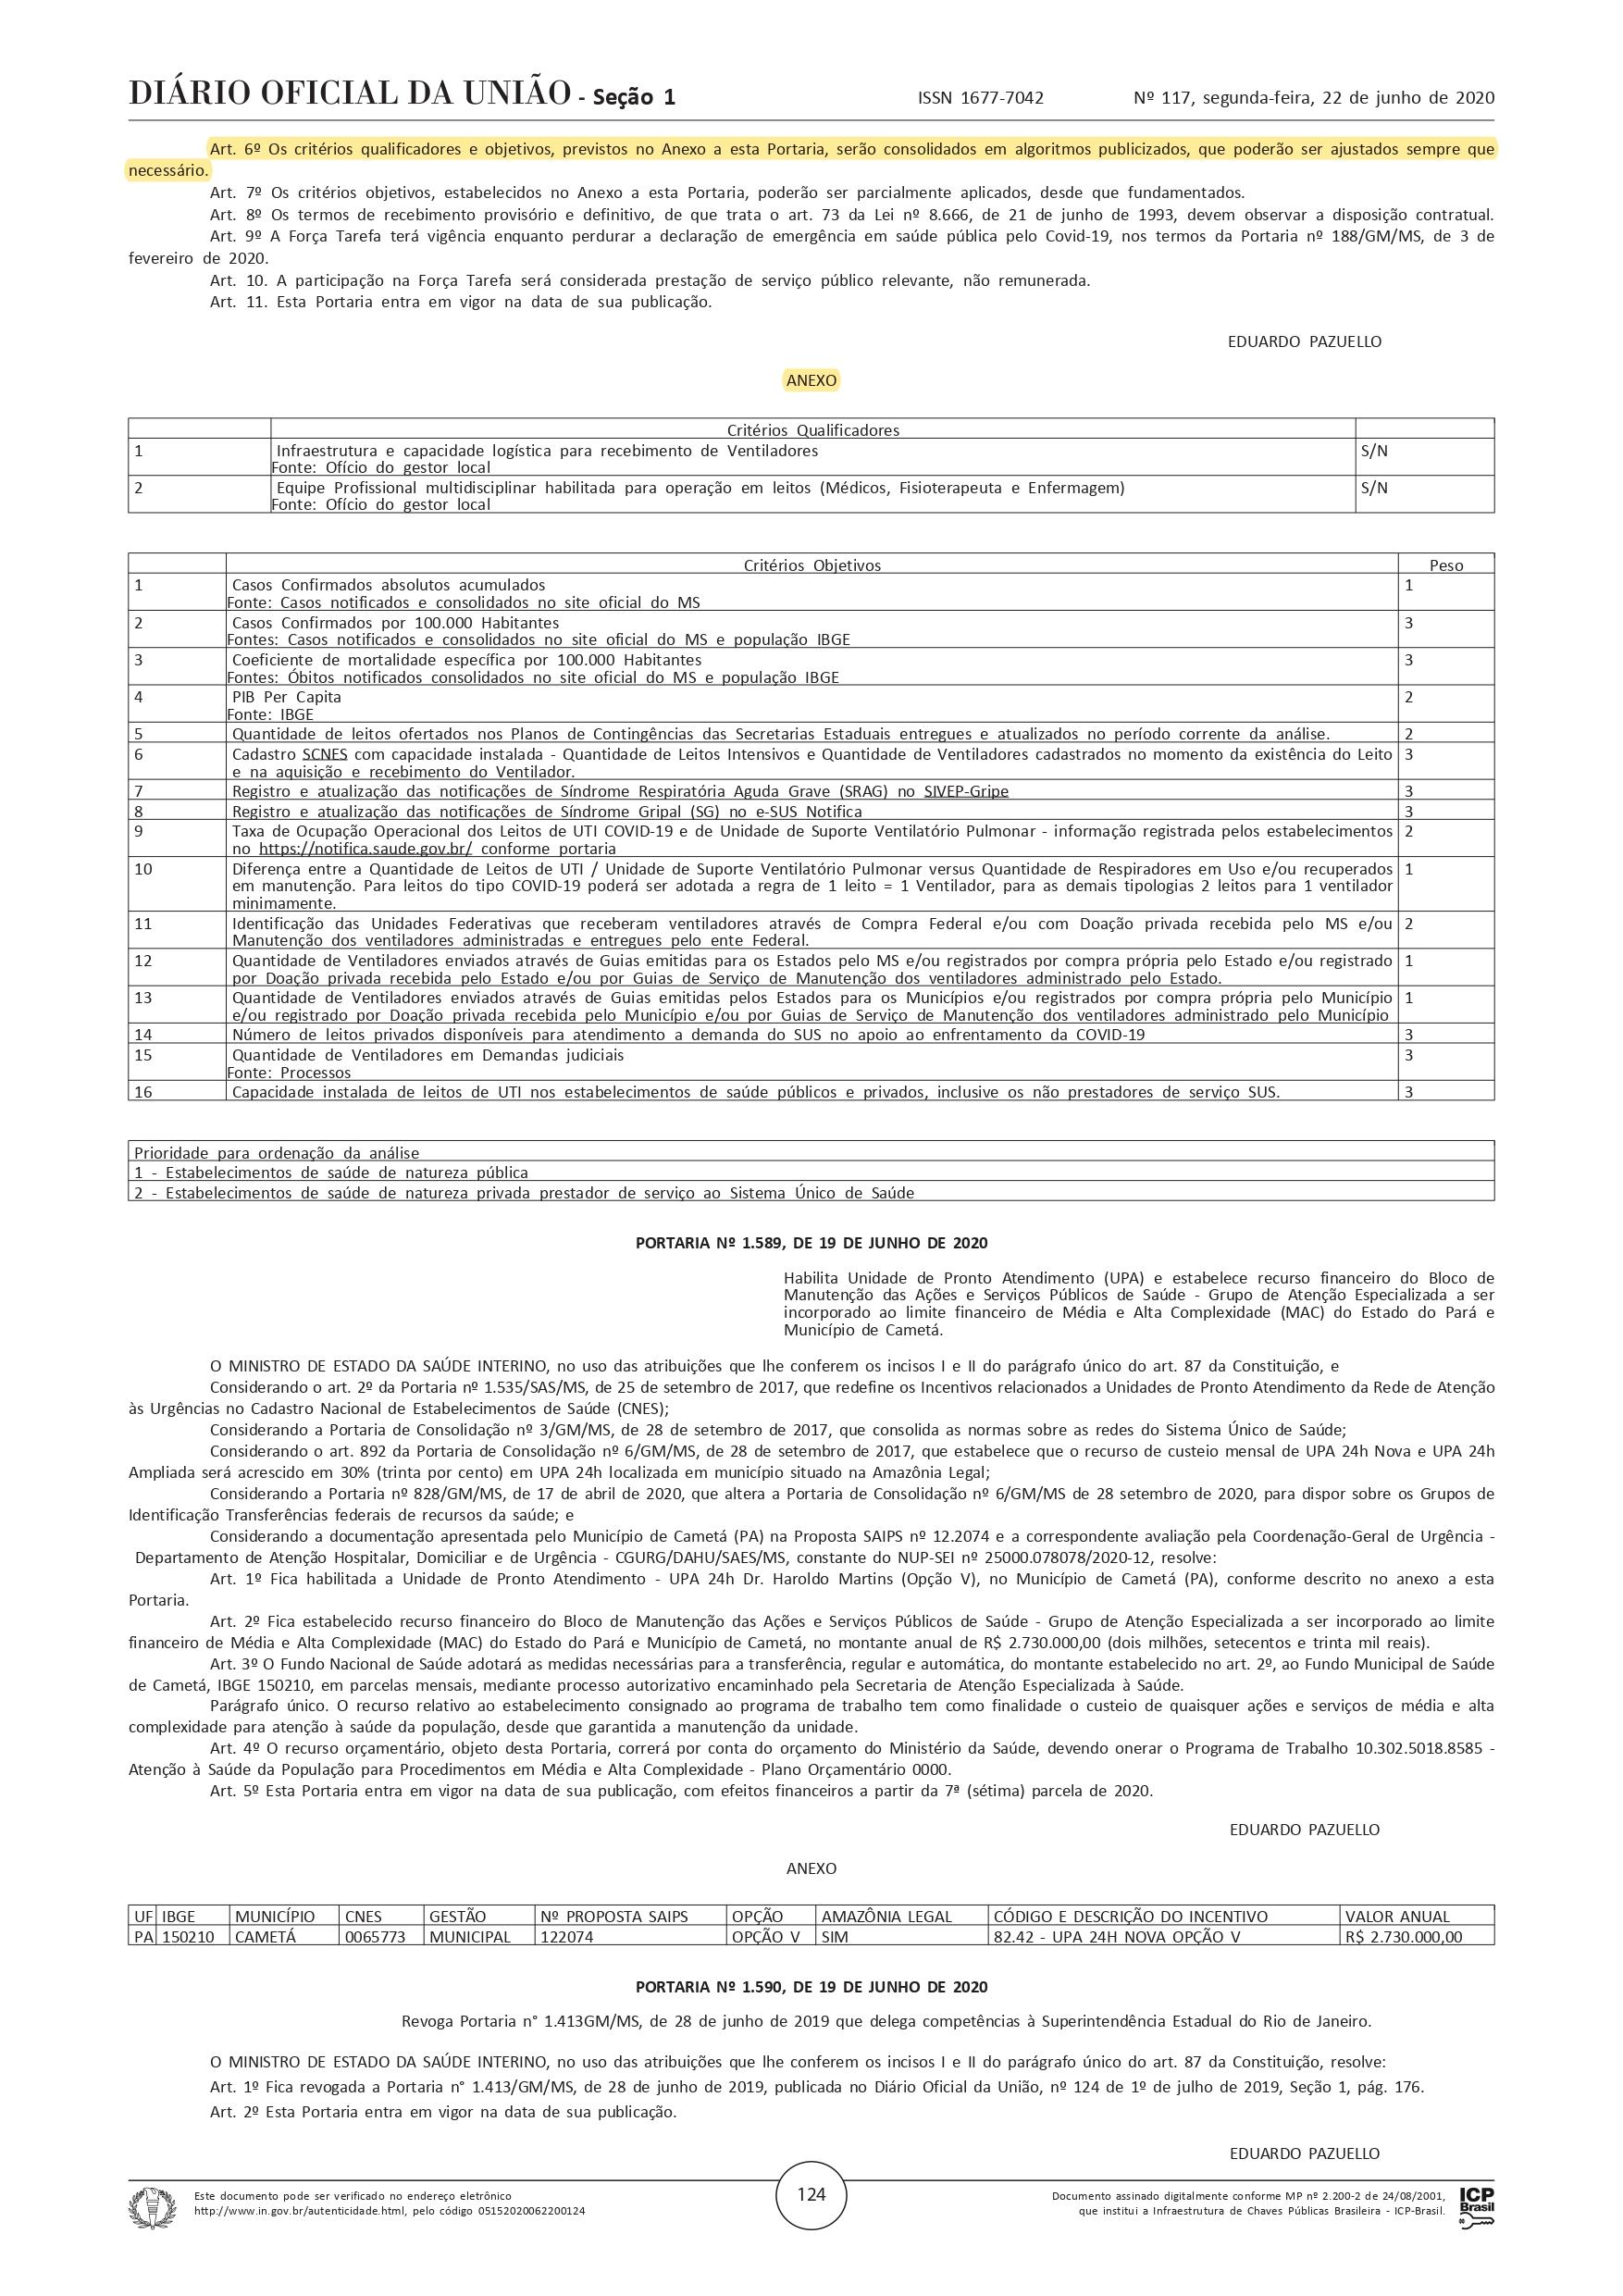 PORTARIA Nº 1.587 DE 19.06.2020_page-0002